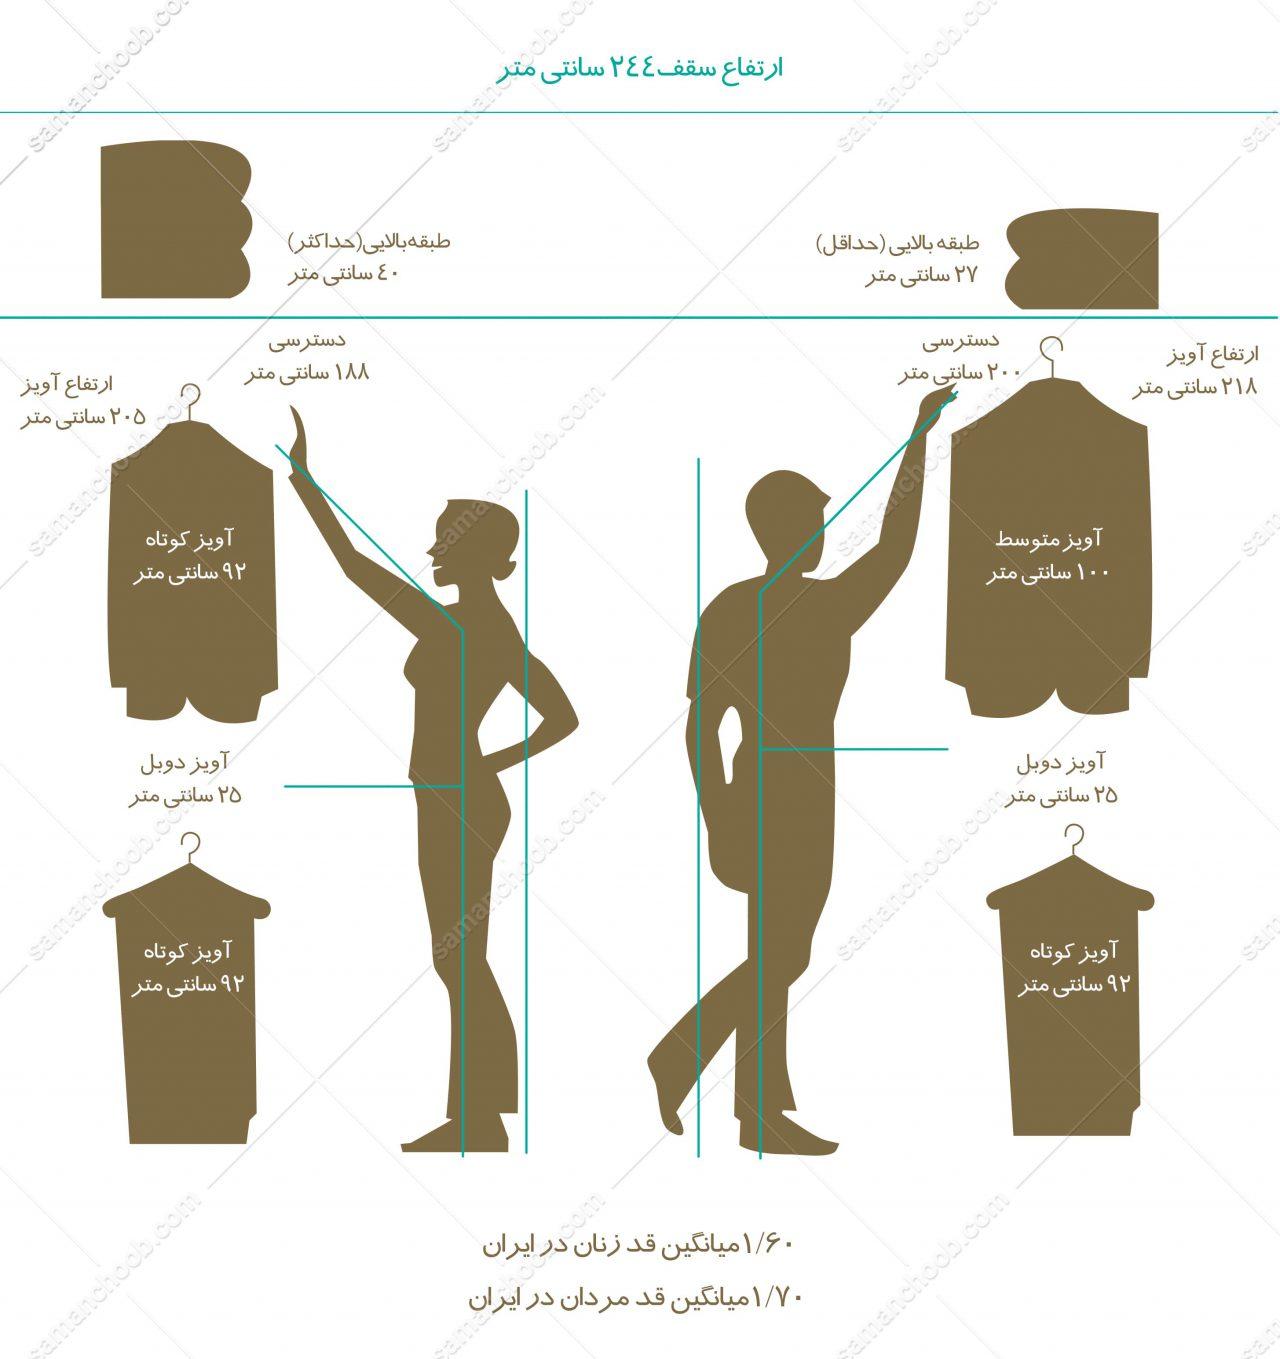 طراحی کمد دیواری,چیدمان کمد دیواری ایرانی,چیدمان کمد دیواری کوچک